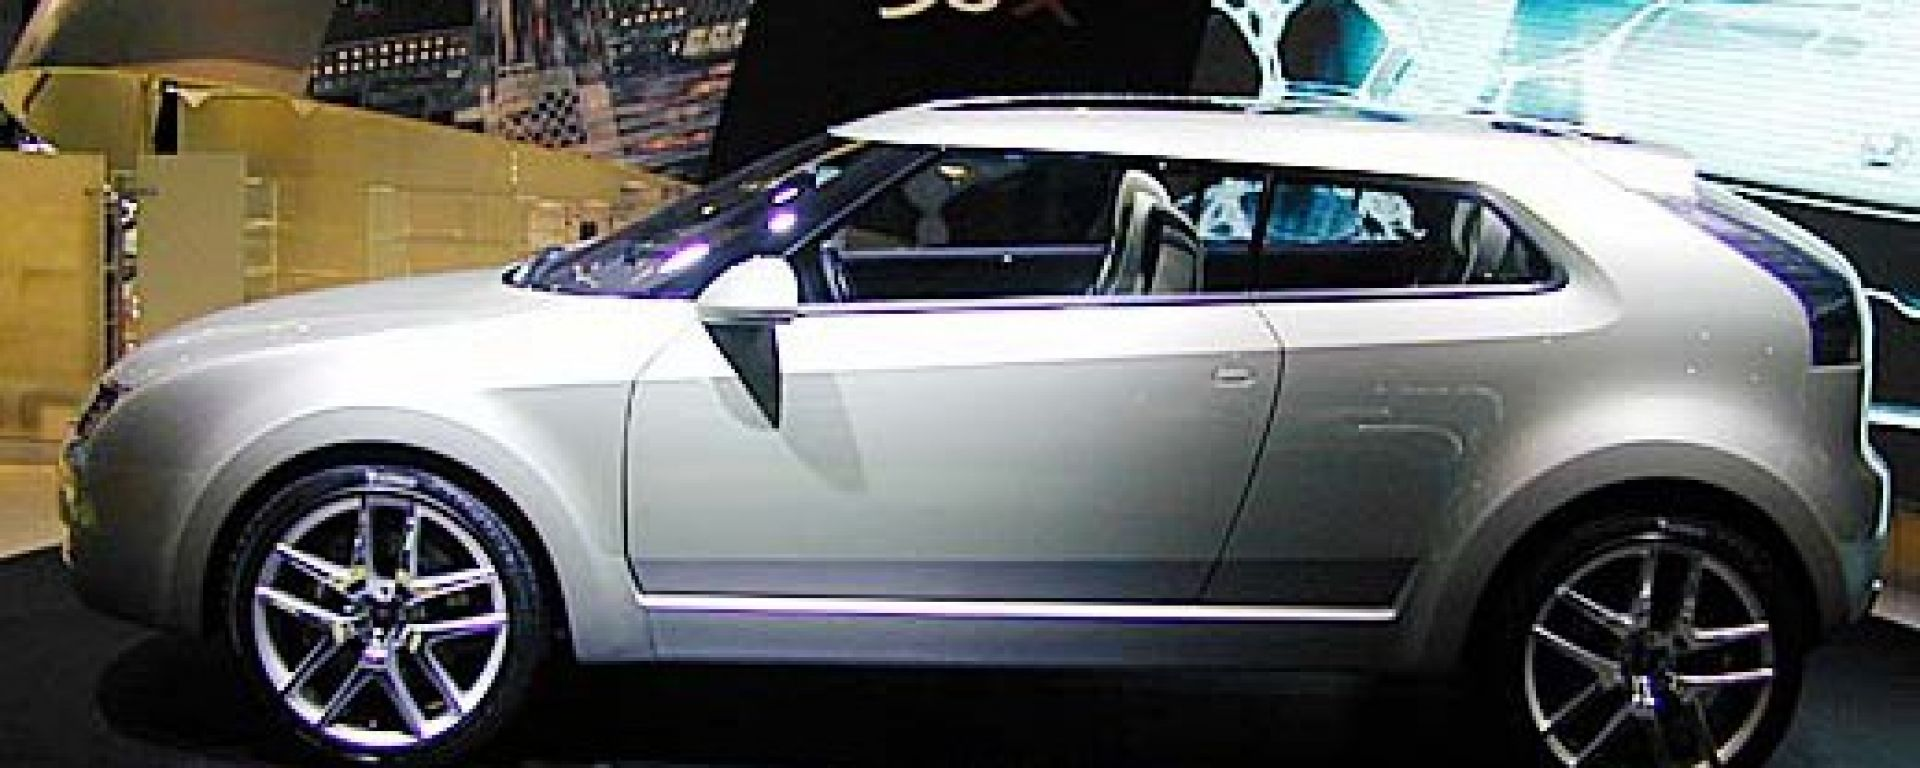 MOTORSHOW: Saab e Opel insieme